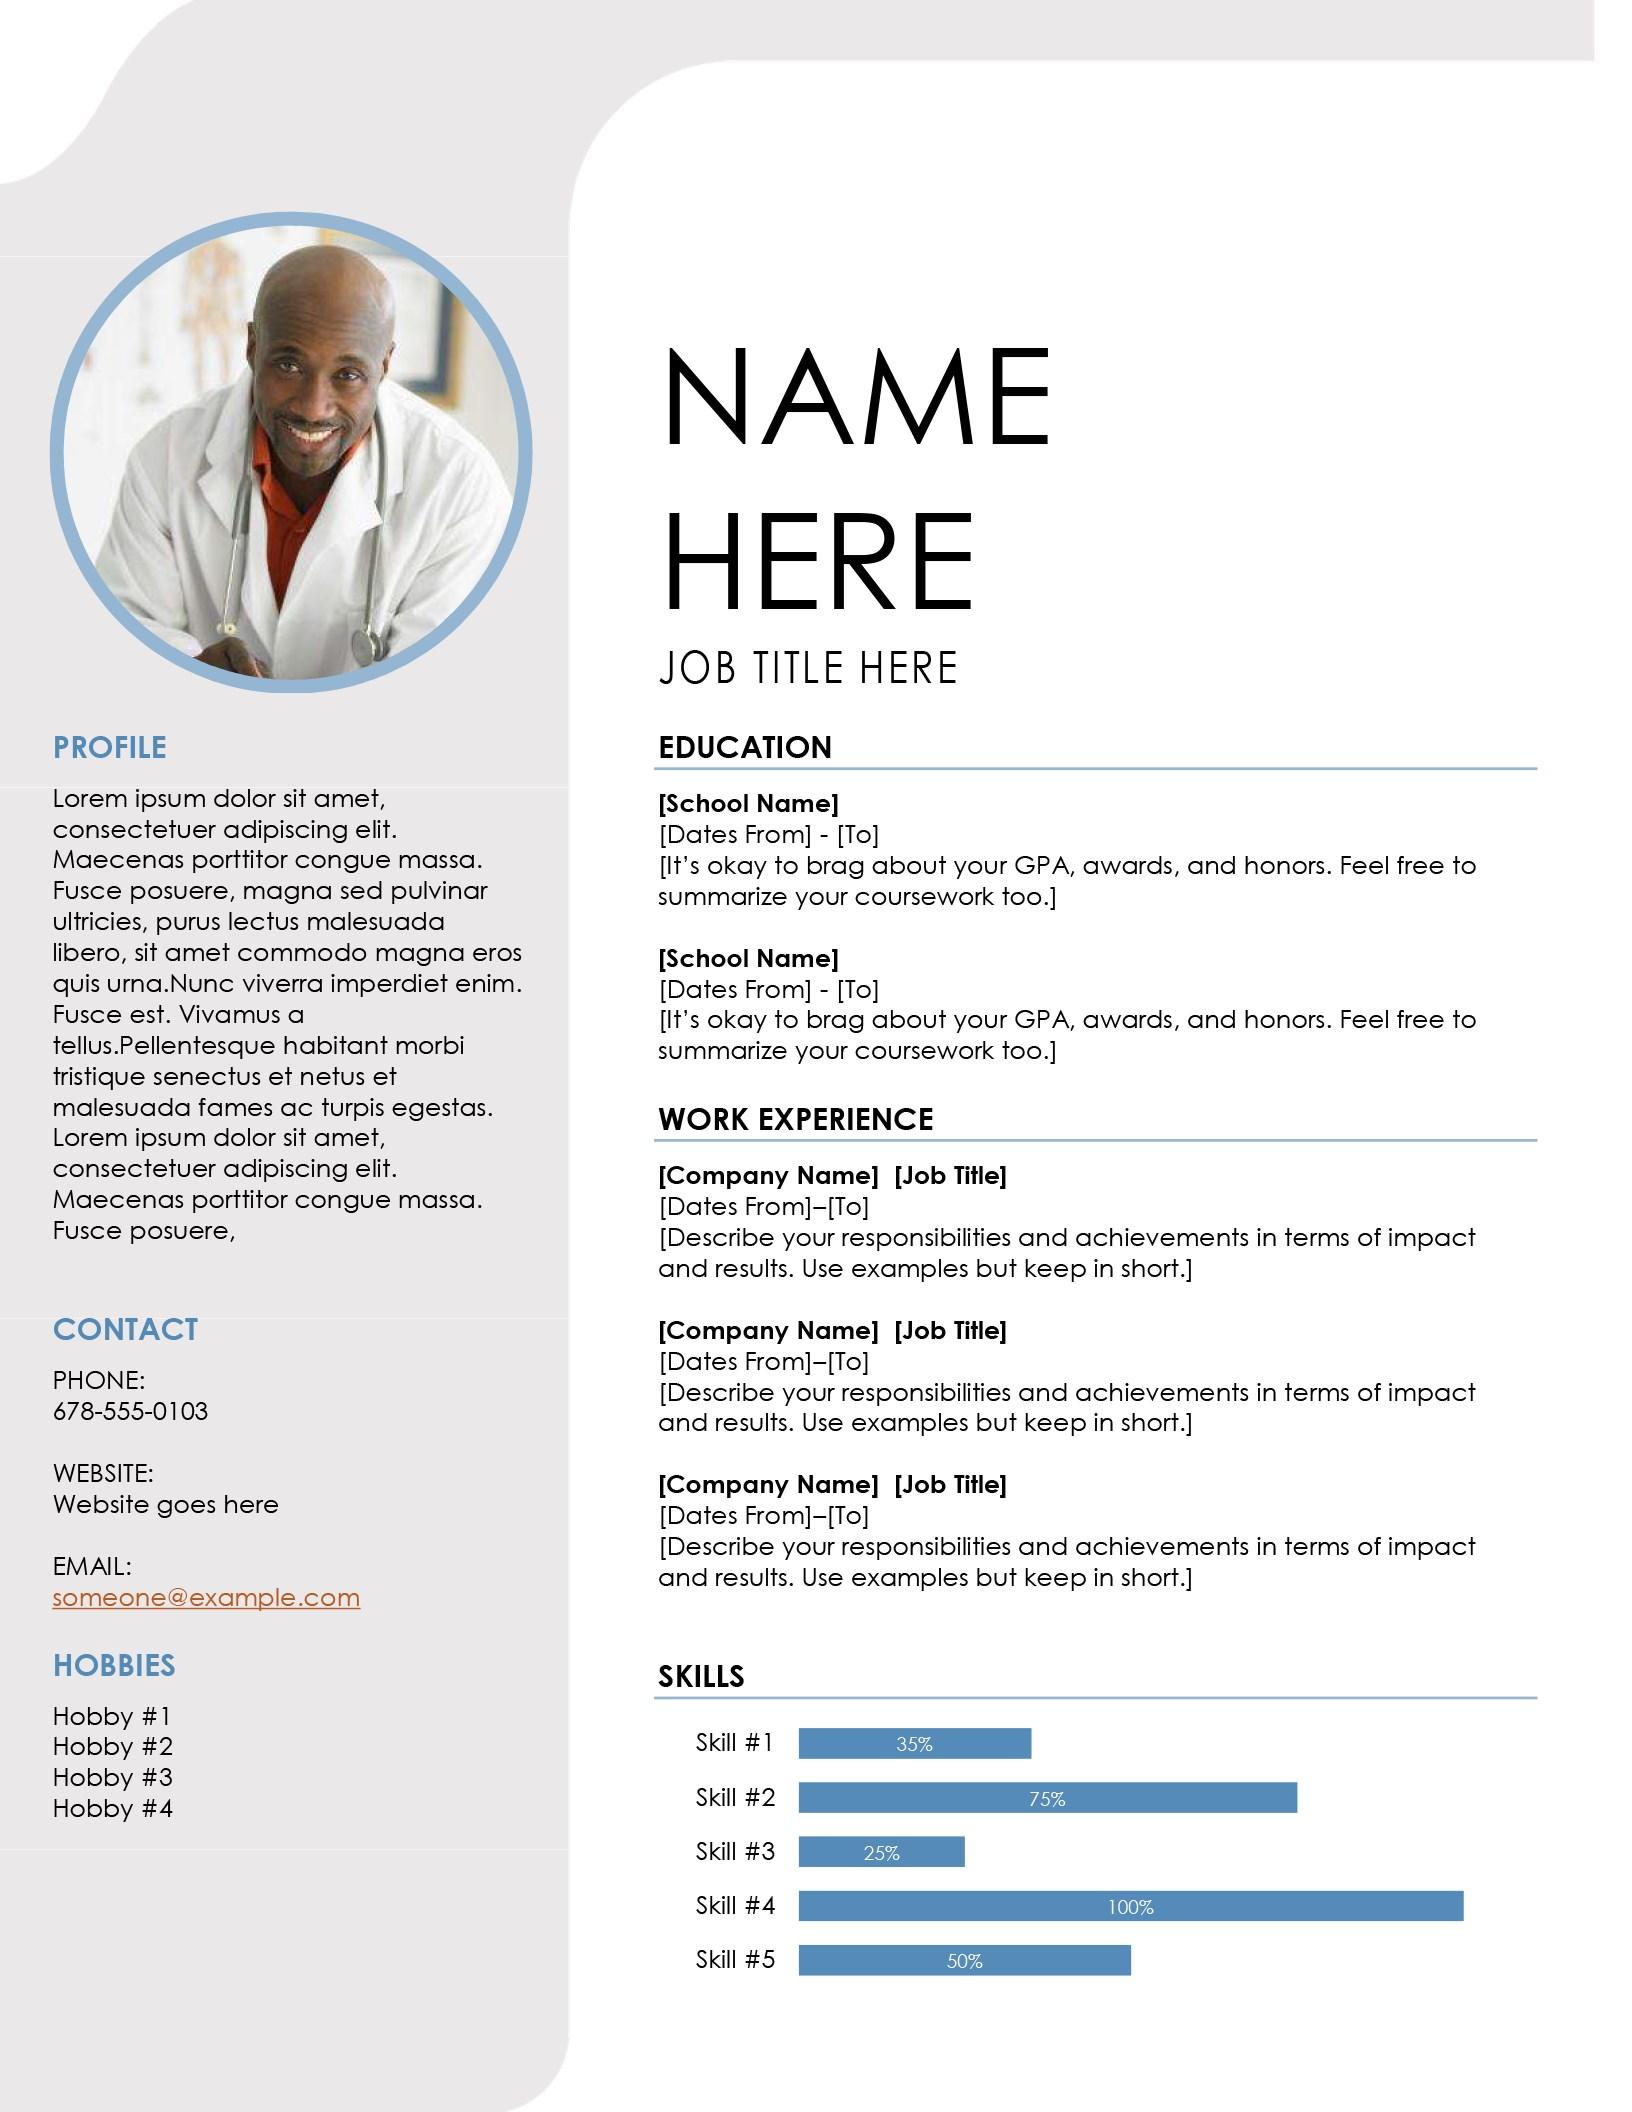 Free Resume Template Image free resume template|wikiresume.com